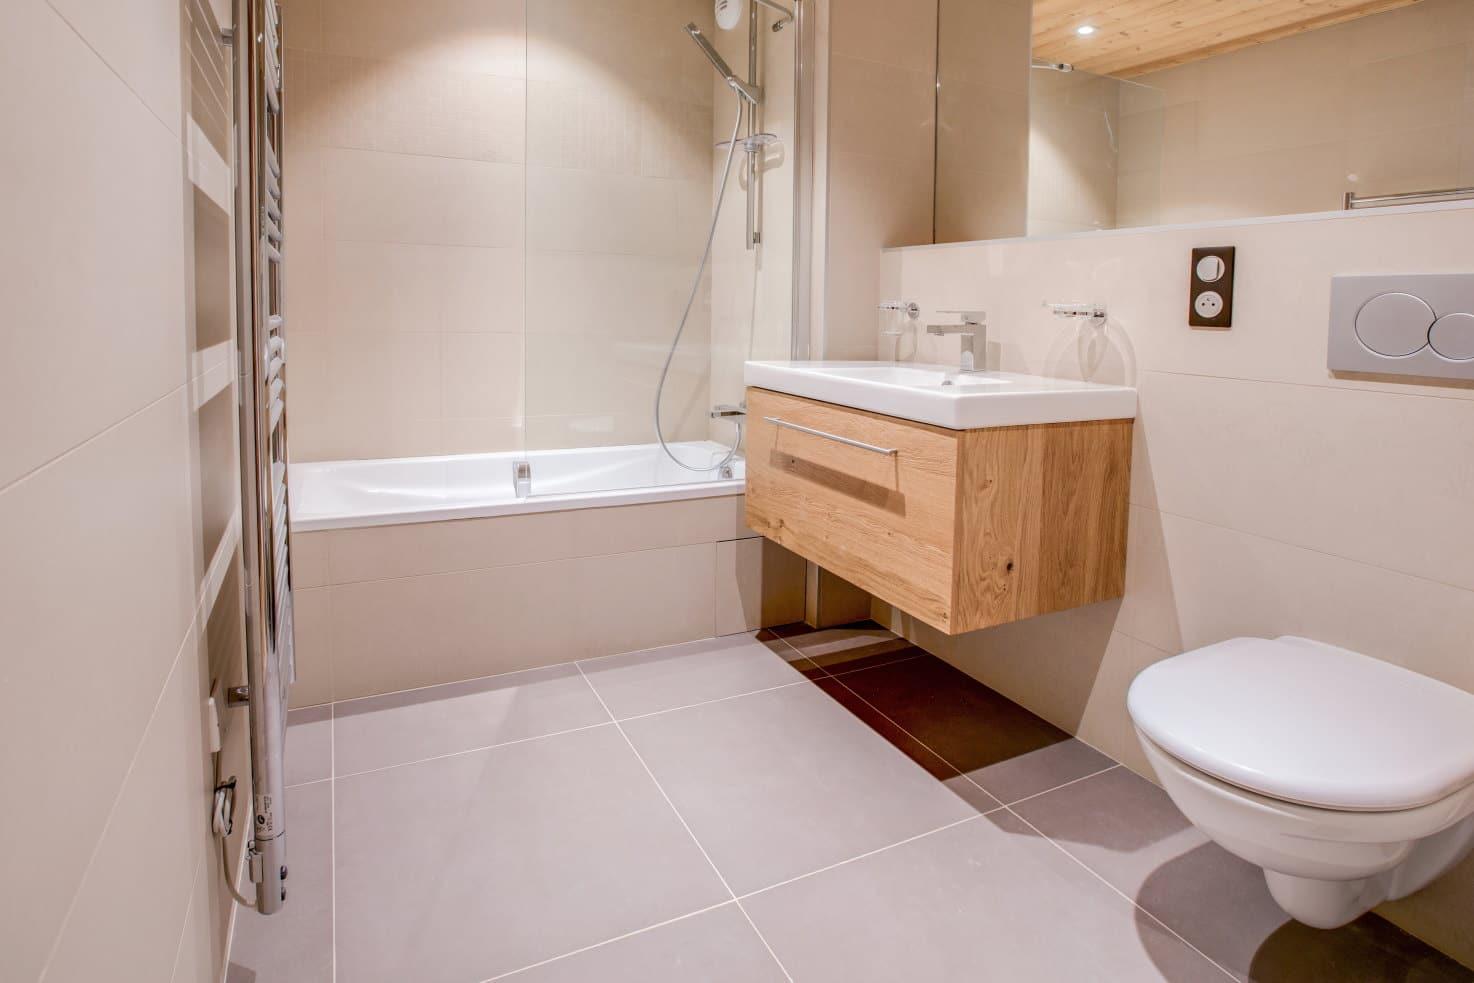 interior kitchens, house beautiful bathrooms, top designer bathrooms, interior decorating, philippe starck bathrooms, on bathrooms interior designer roches